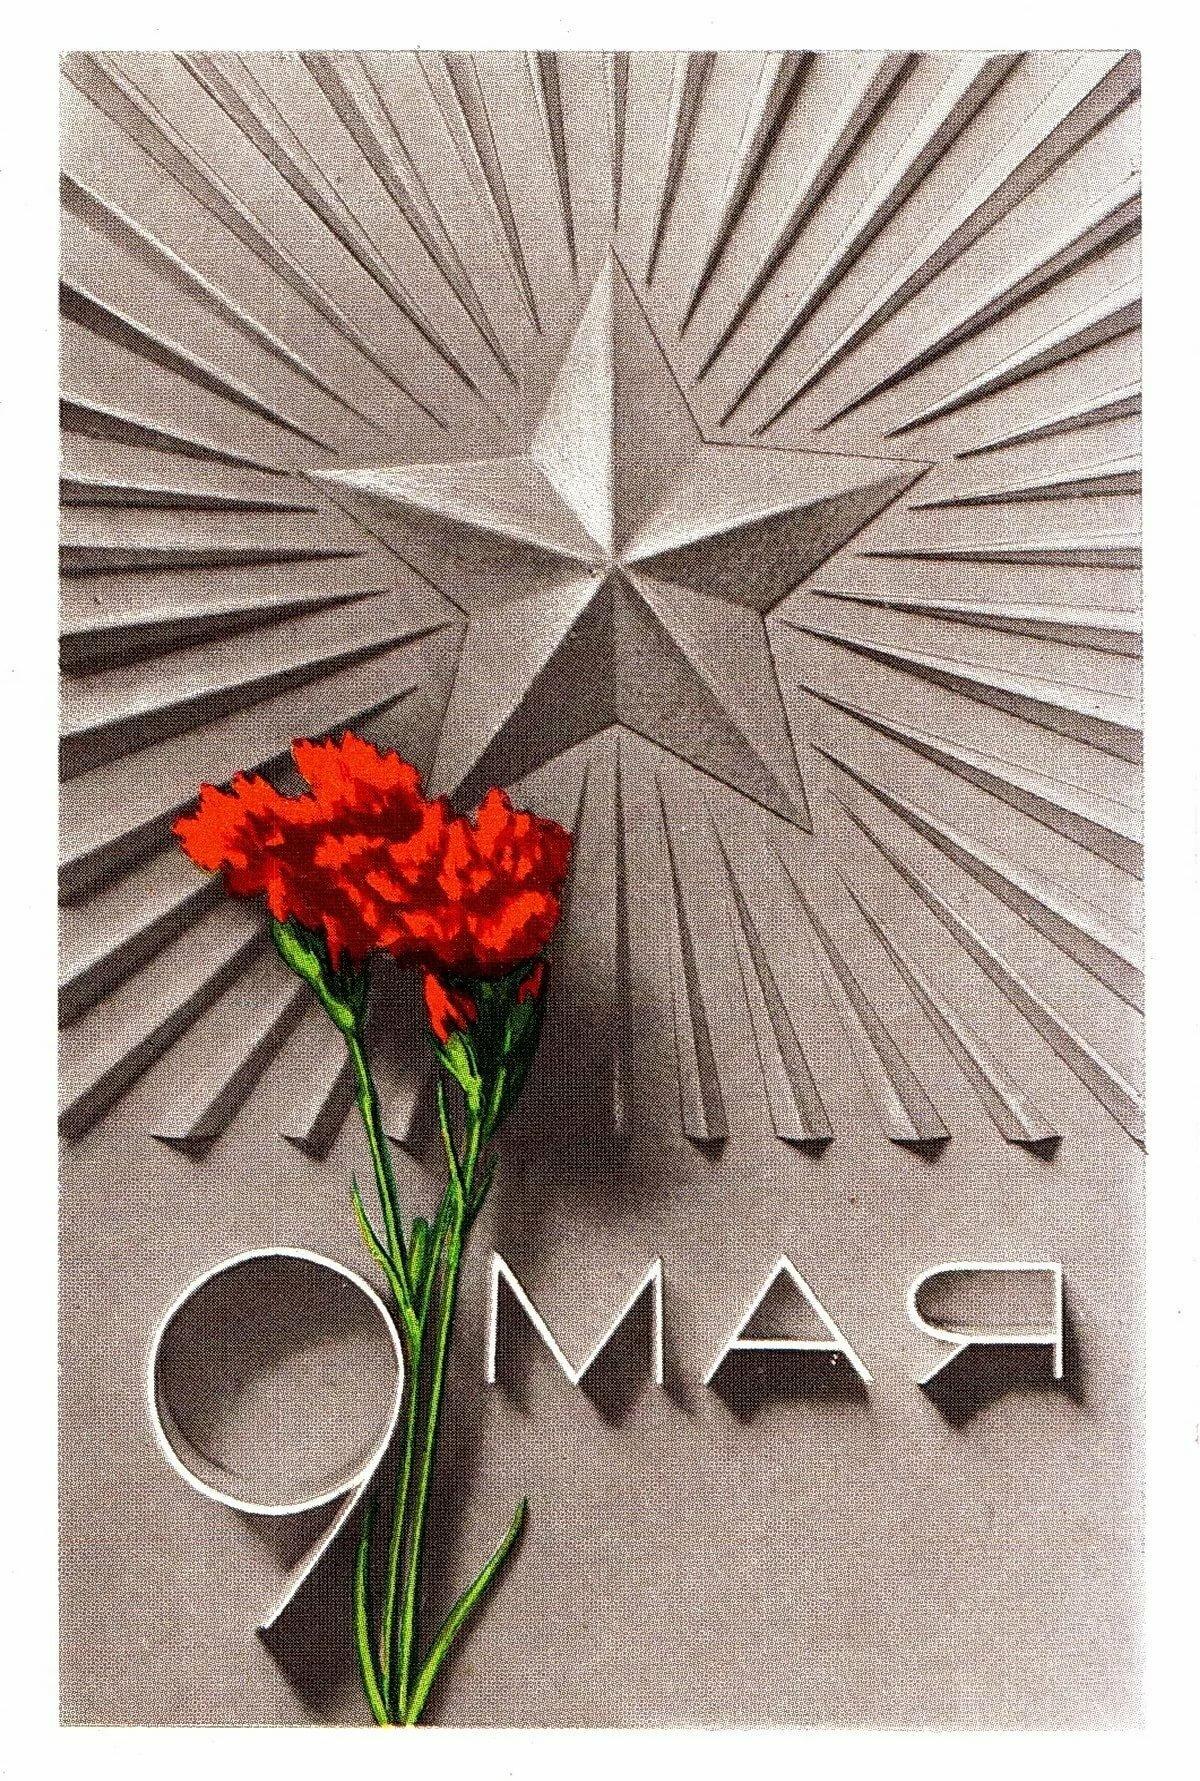 картинки с 9 мая советских времен